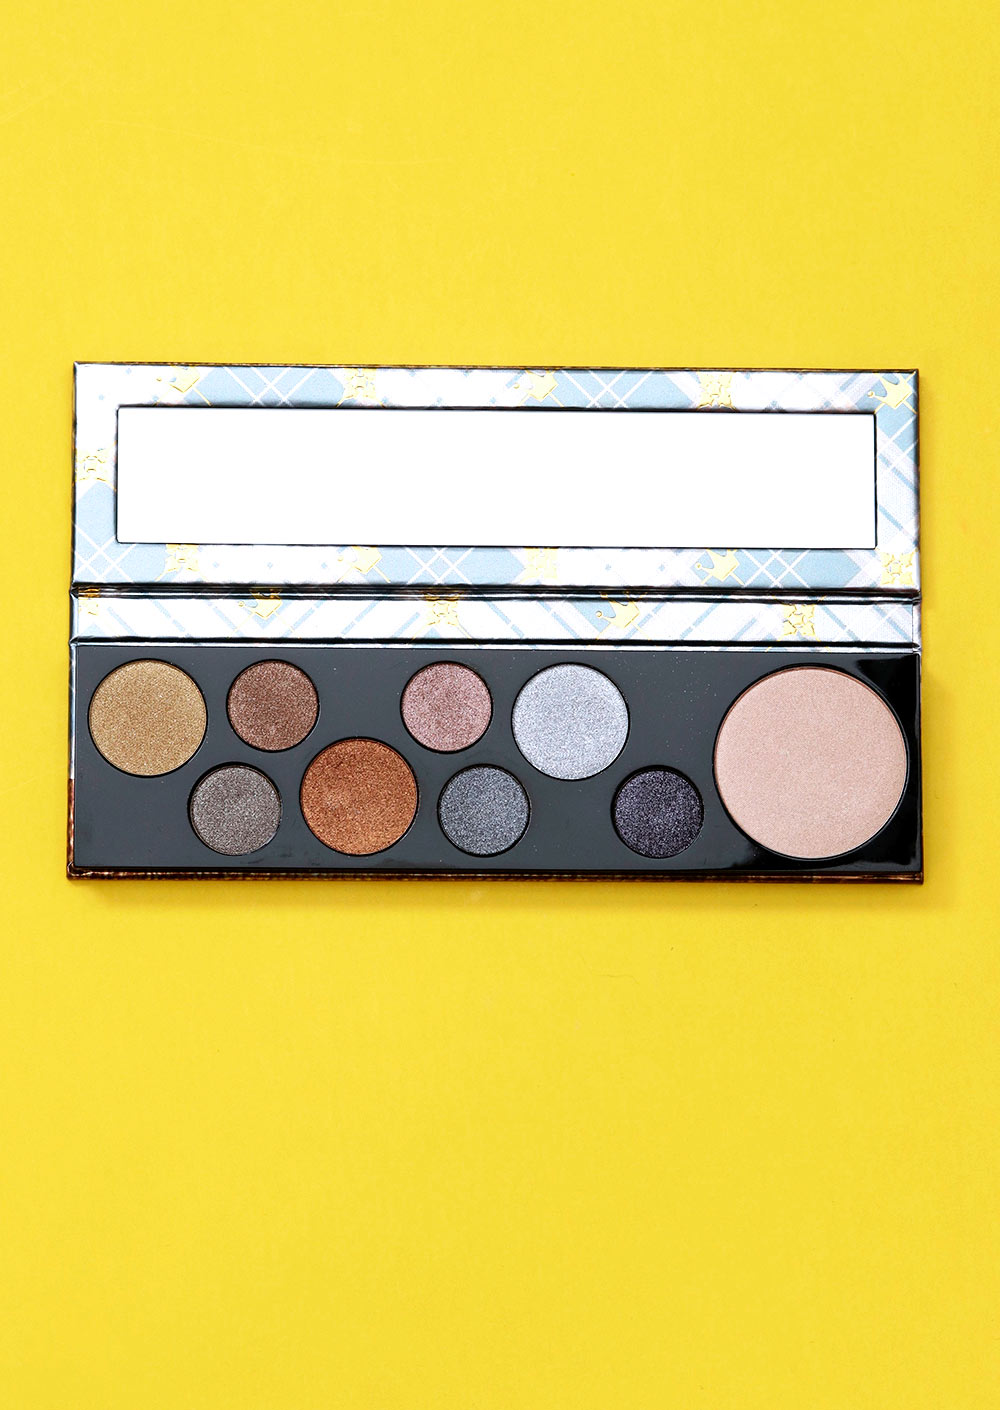 mac qween supreme palette closeup